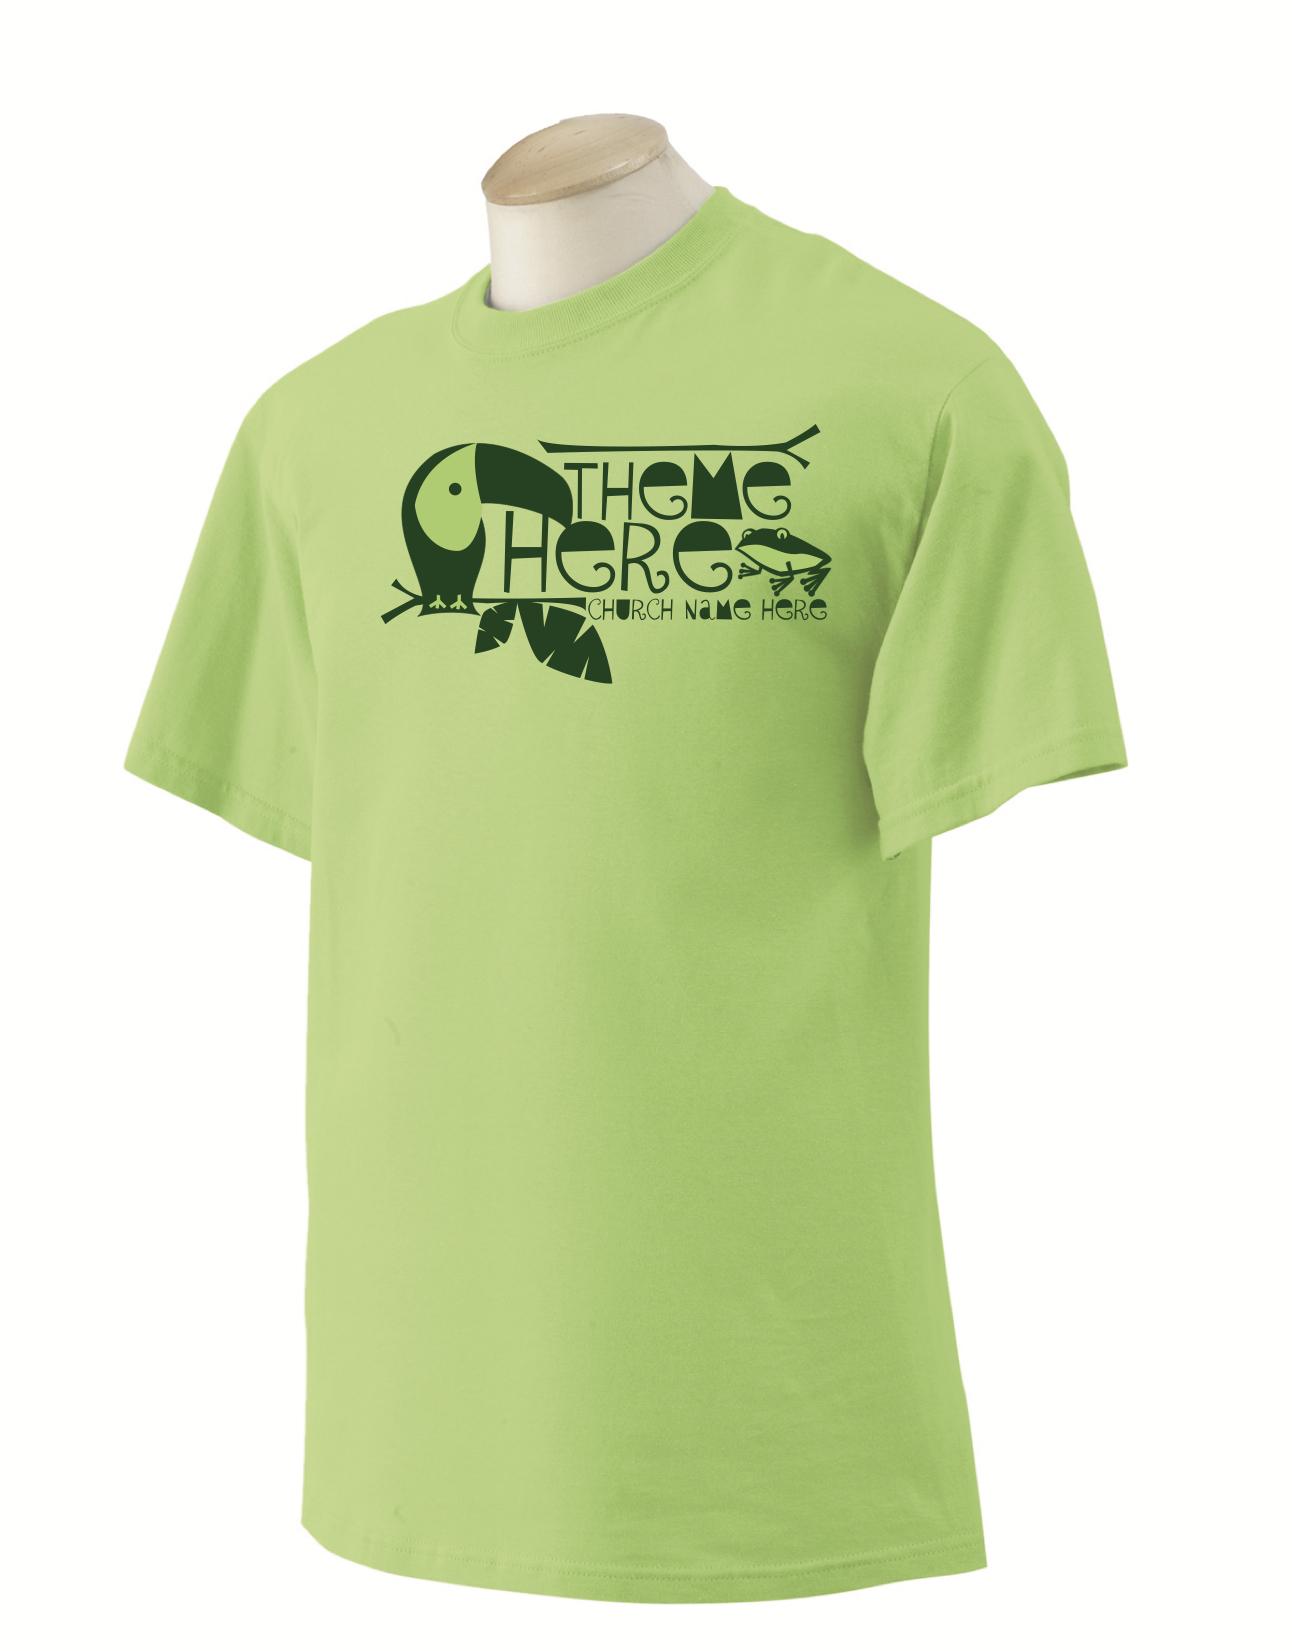 rainforest 1 lime shirt.jpg